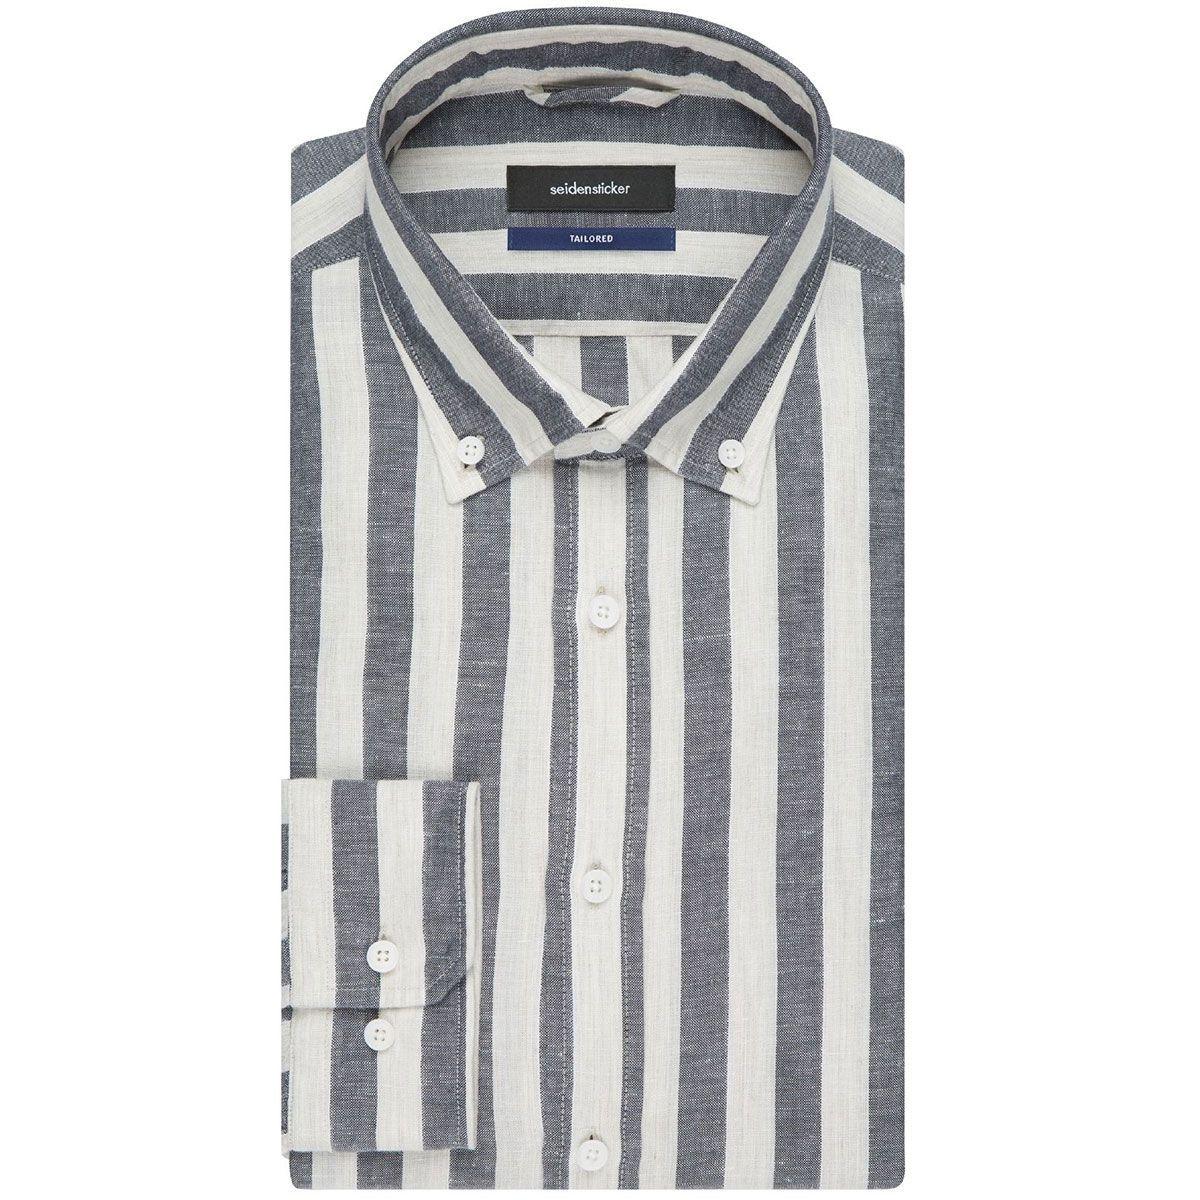 Chemise ajustée rayures col boutonné